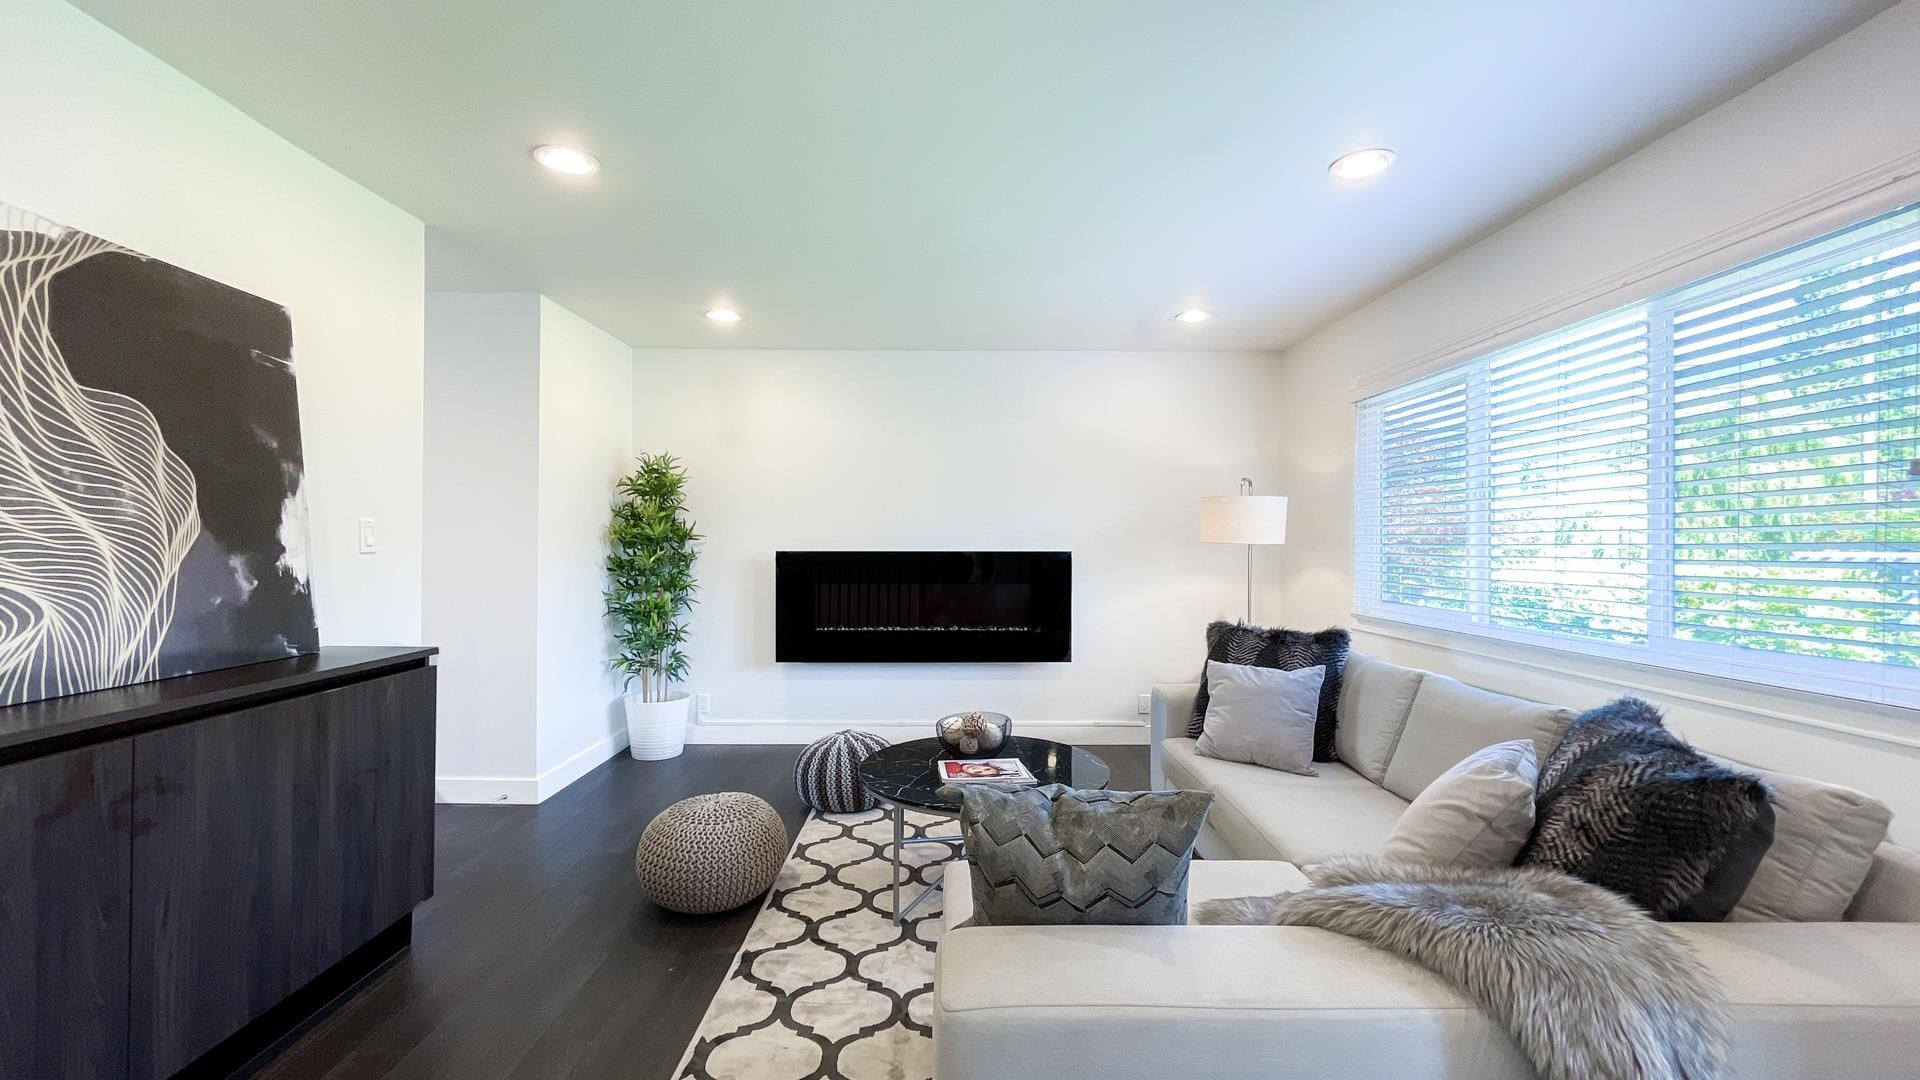 1168 JEFFERSON AVENUE - Ambleside House/Single Family for sale, 6 Bedrooms (R2602275) - #3